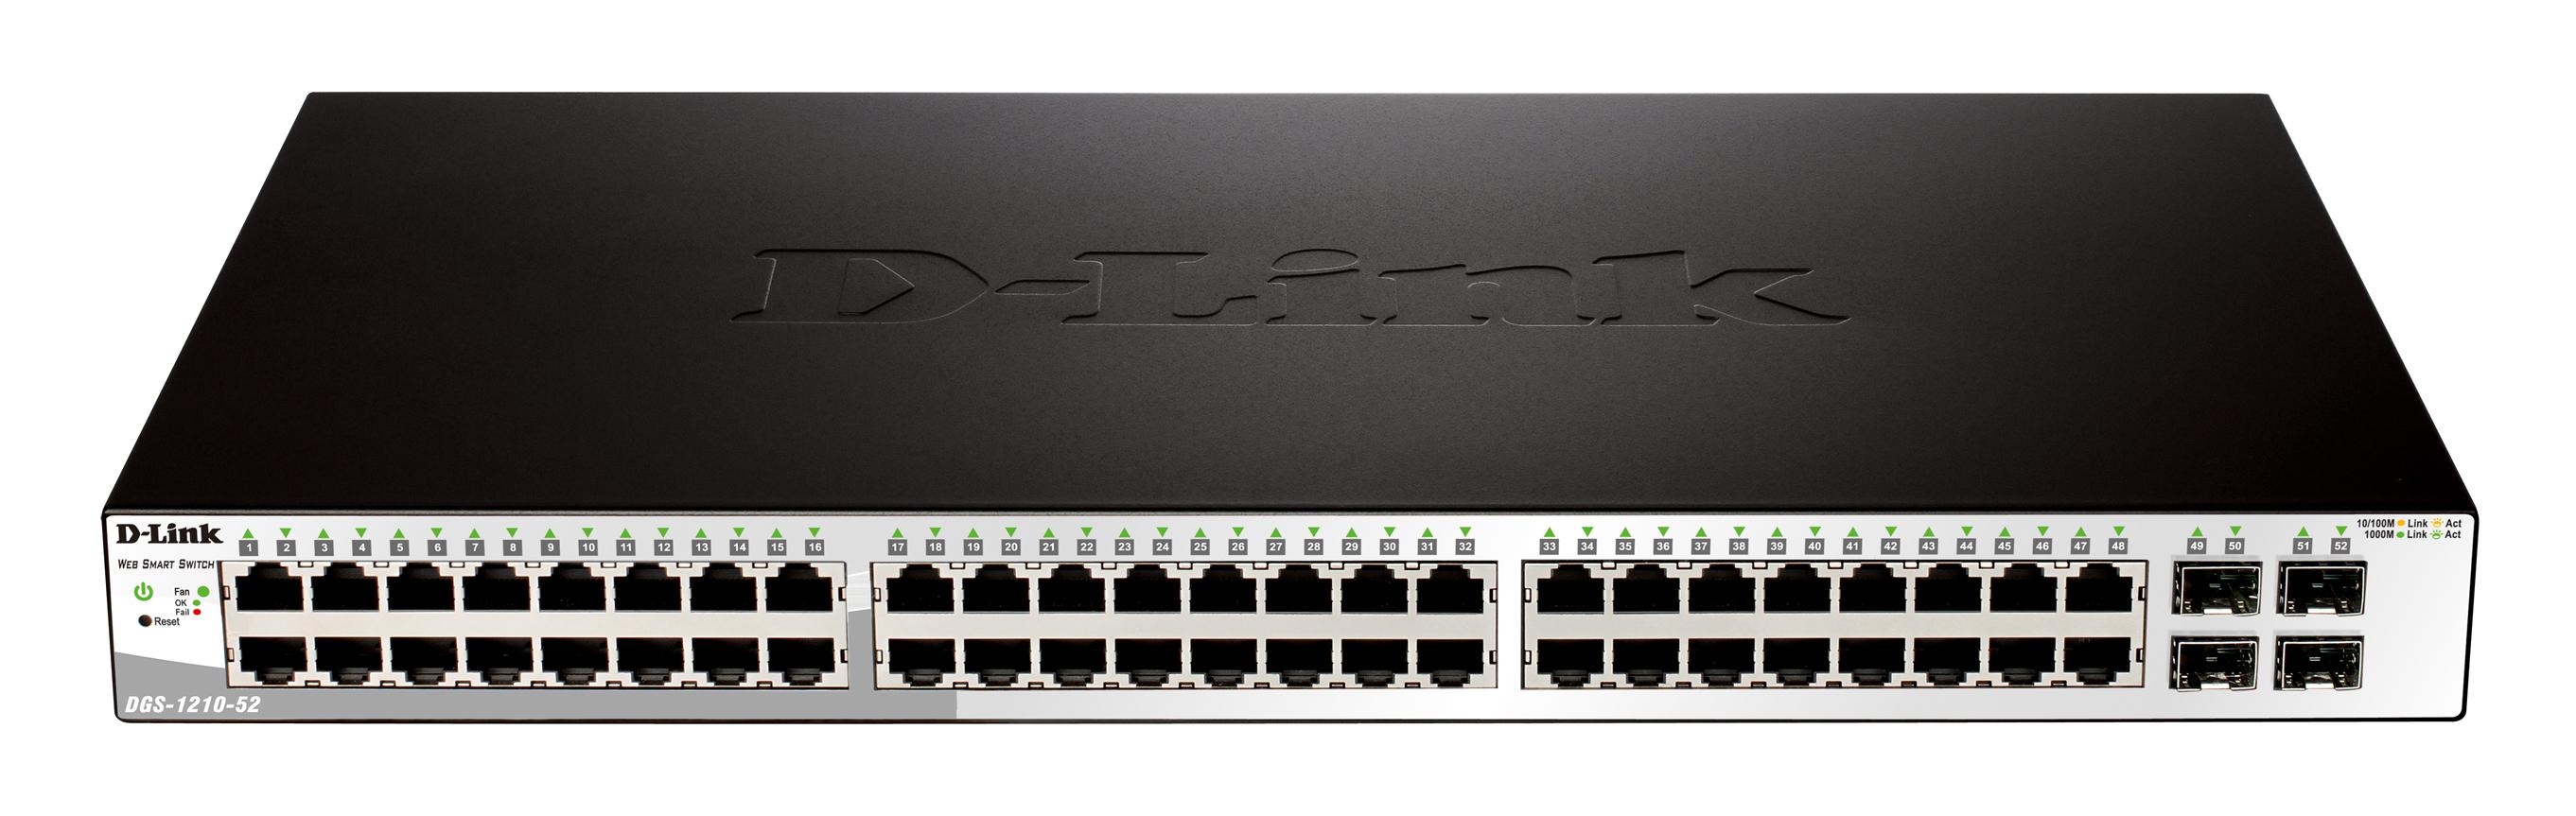 D-LINK 52-Port PoE Gigabit Smart Switch 24 PoE ports